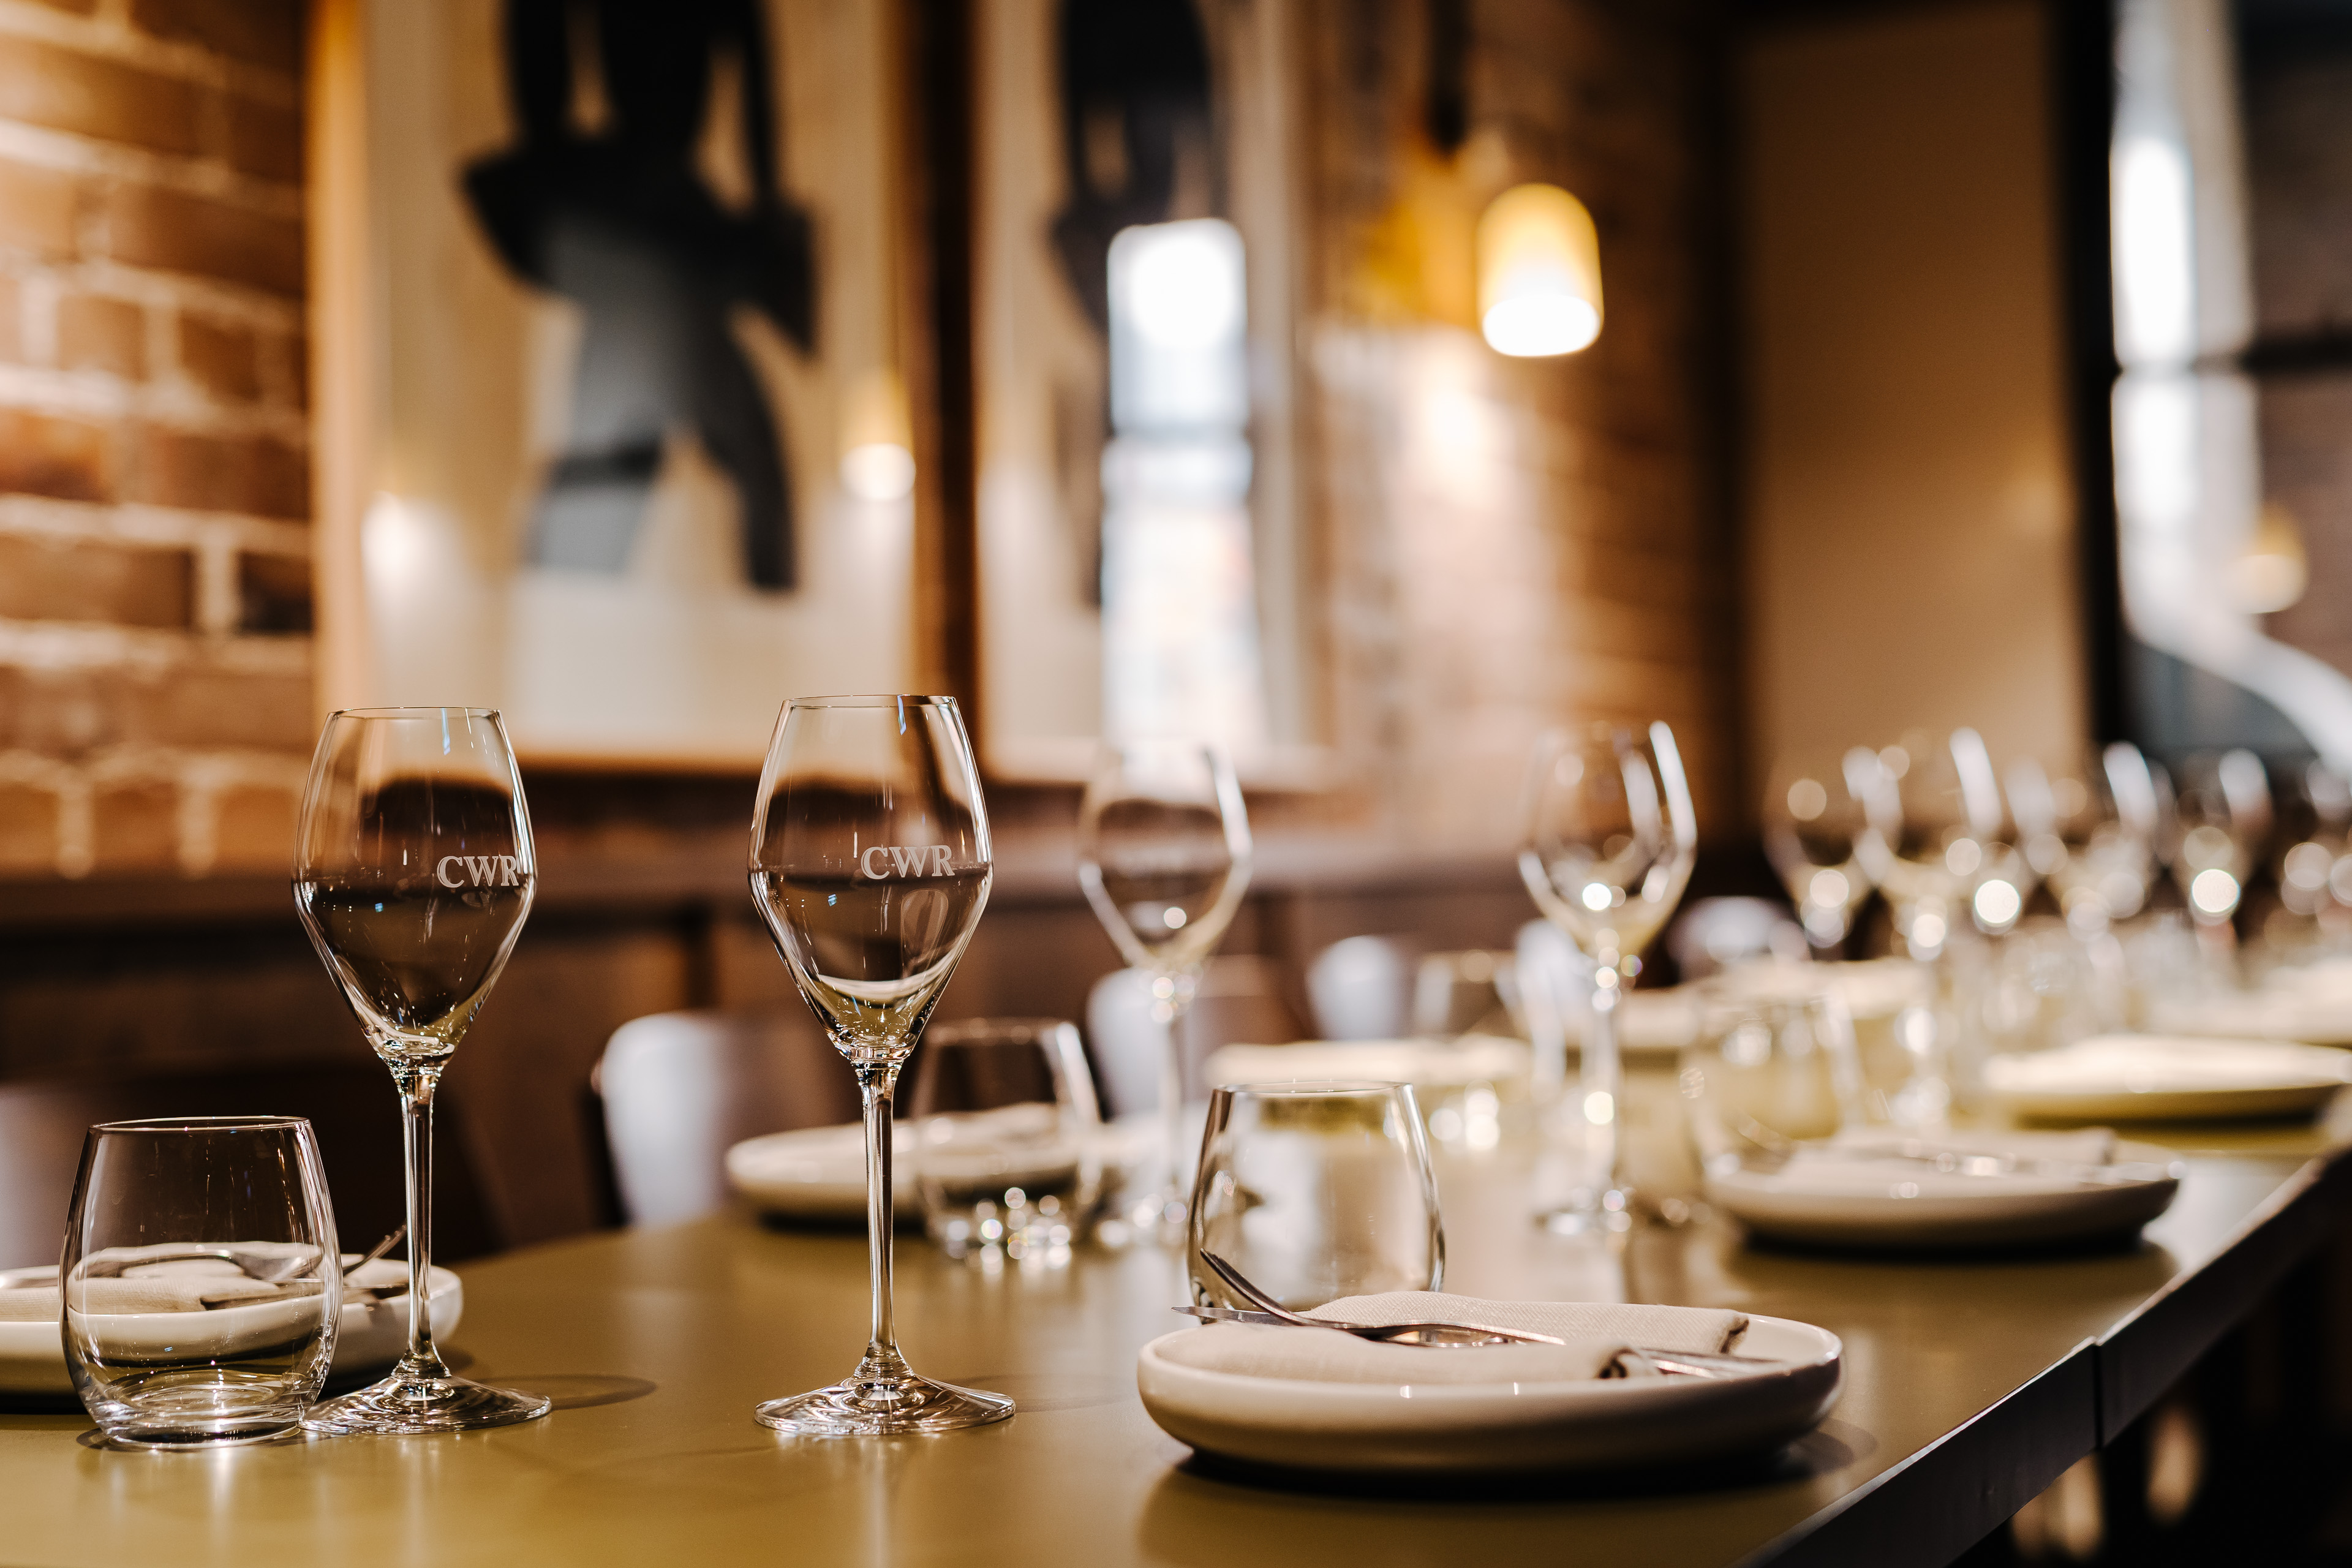 coogee wine room logo branding glassware